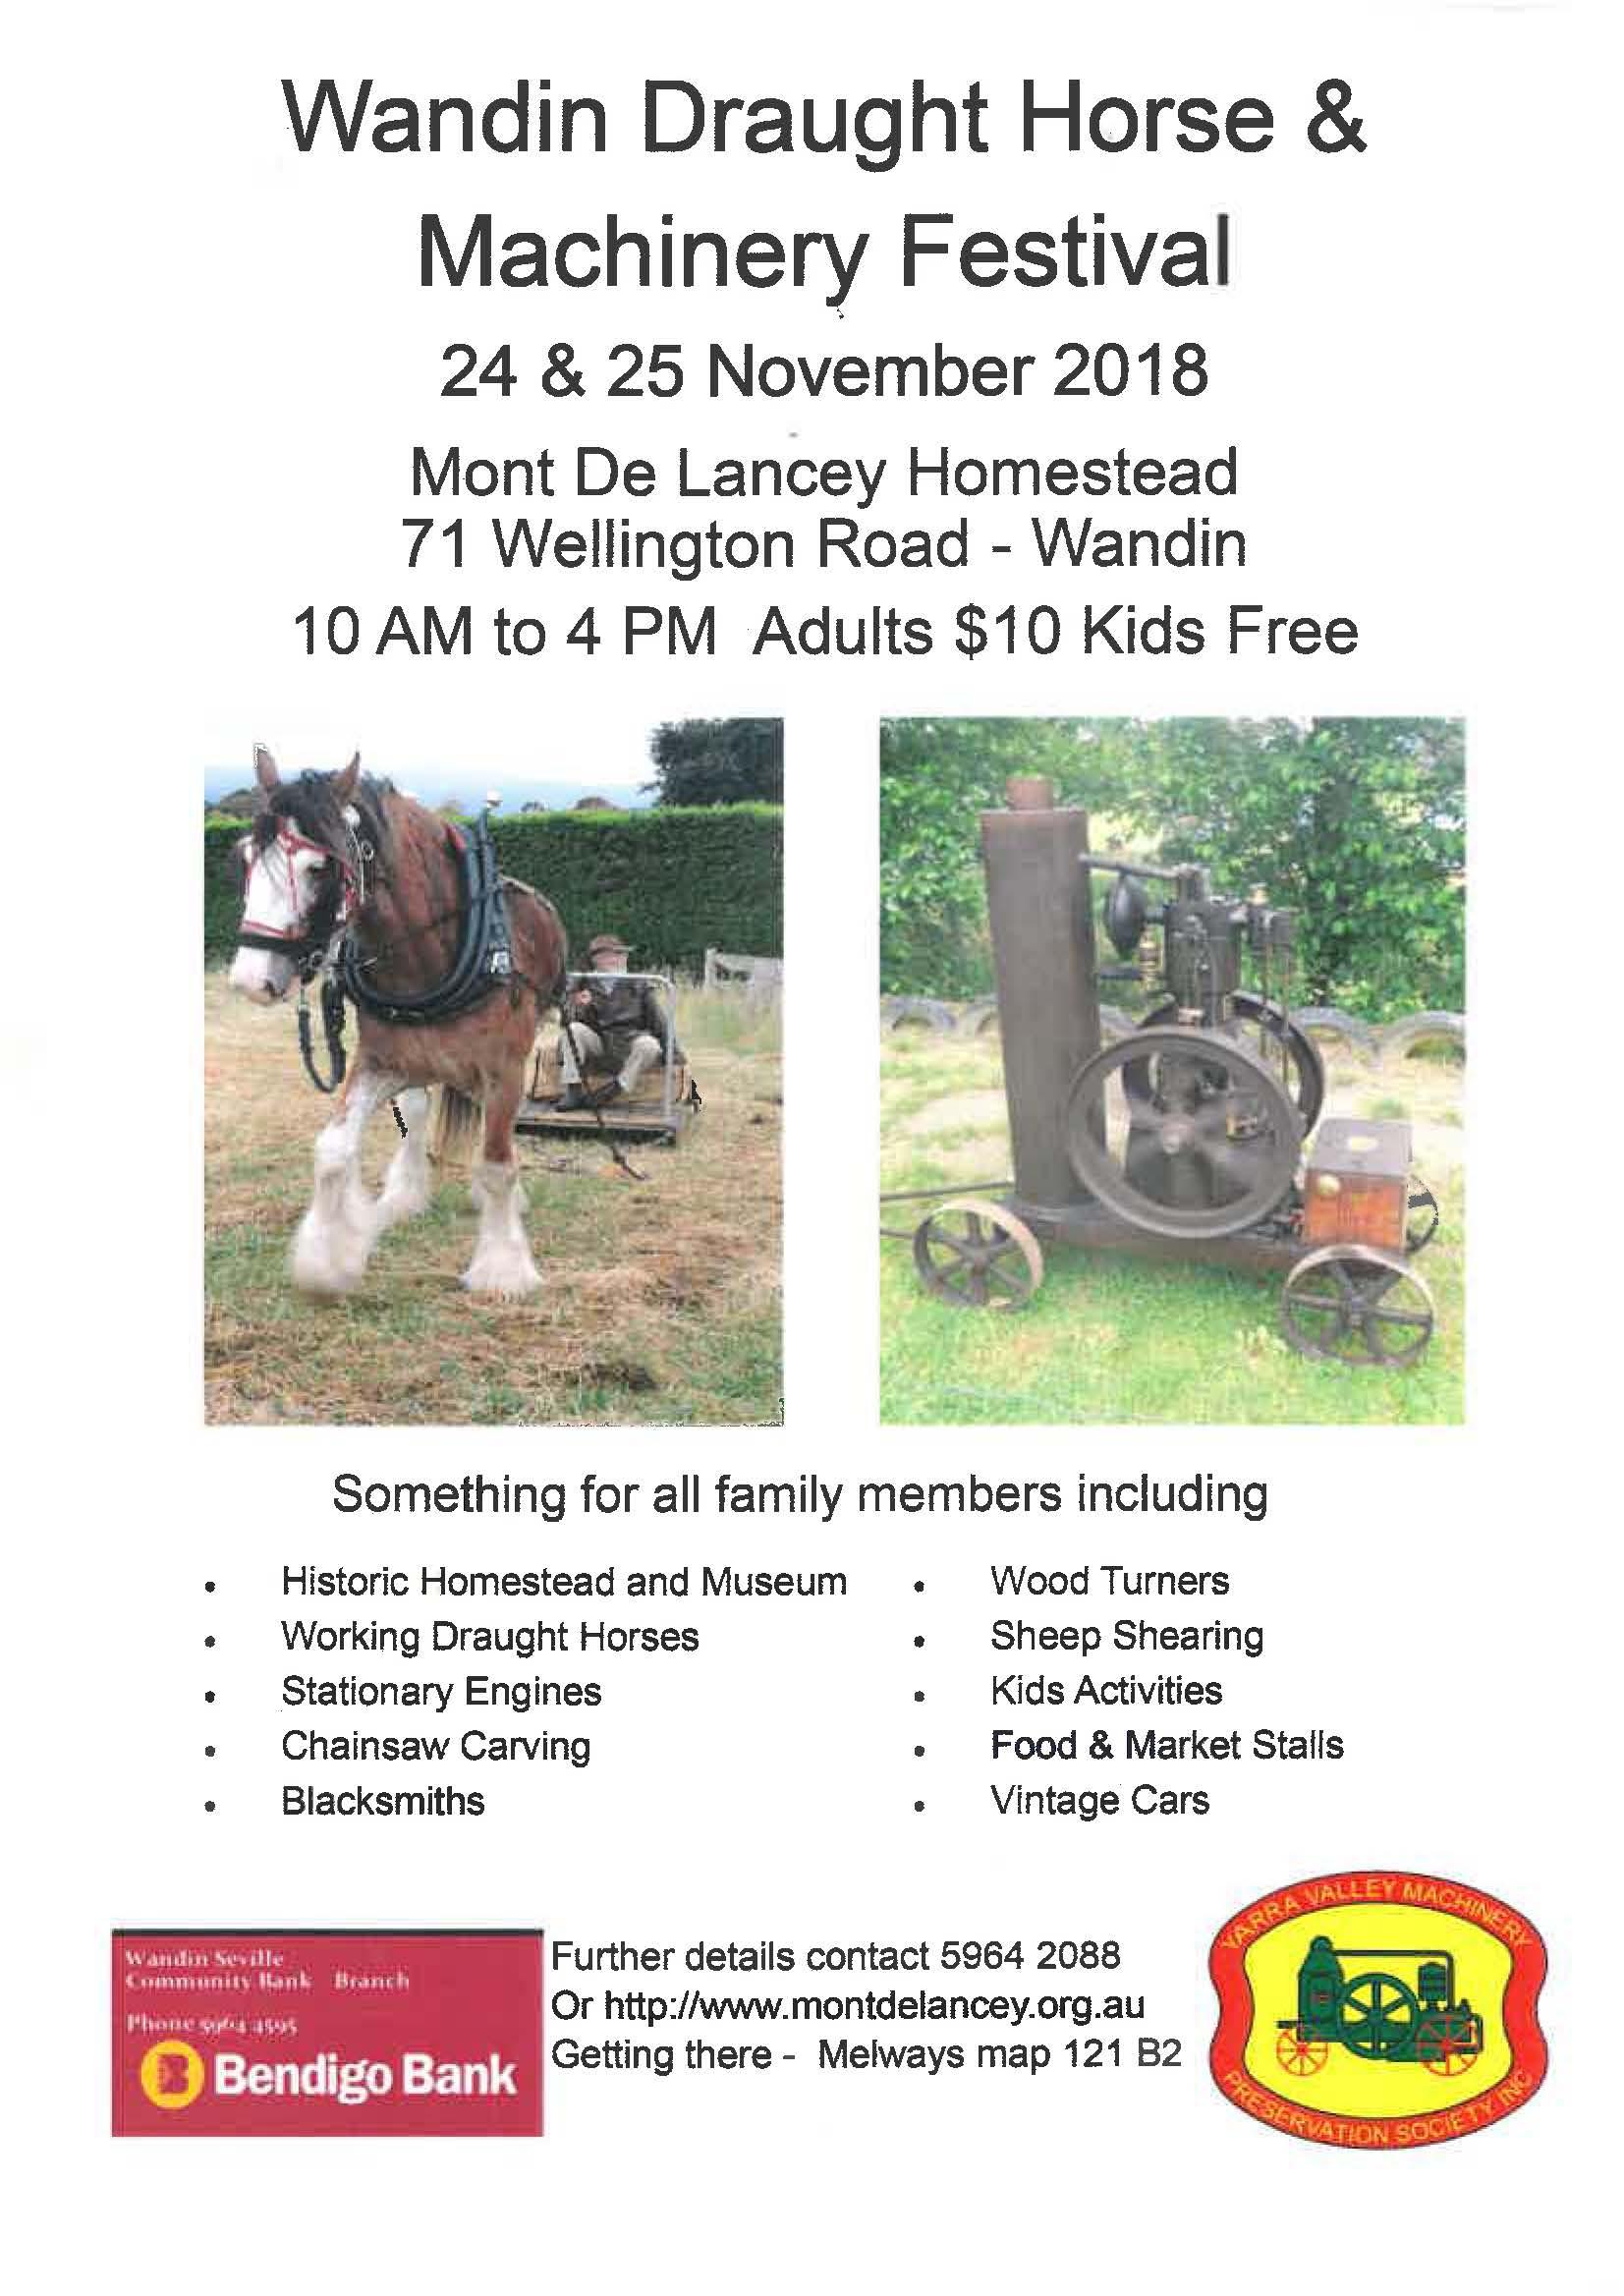 Wandin Draught Horse & Machinery Festival.jpg